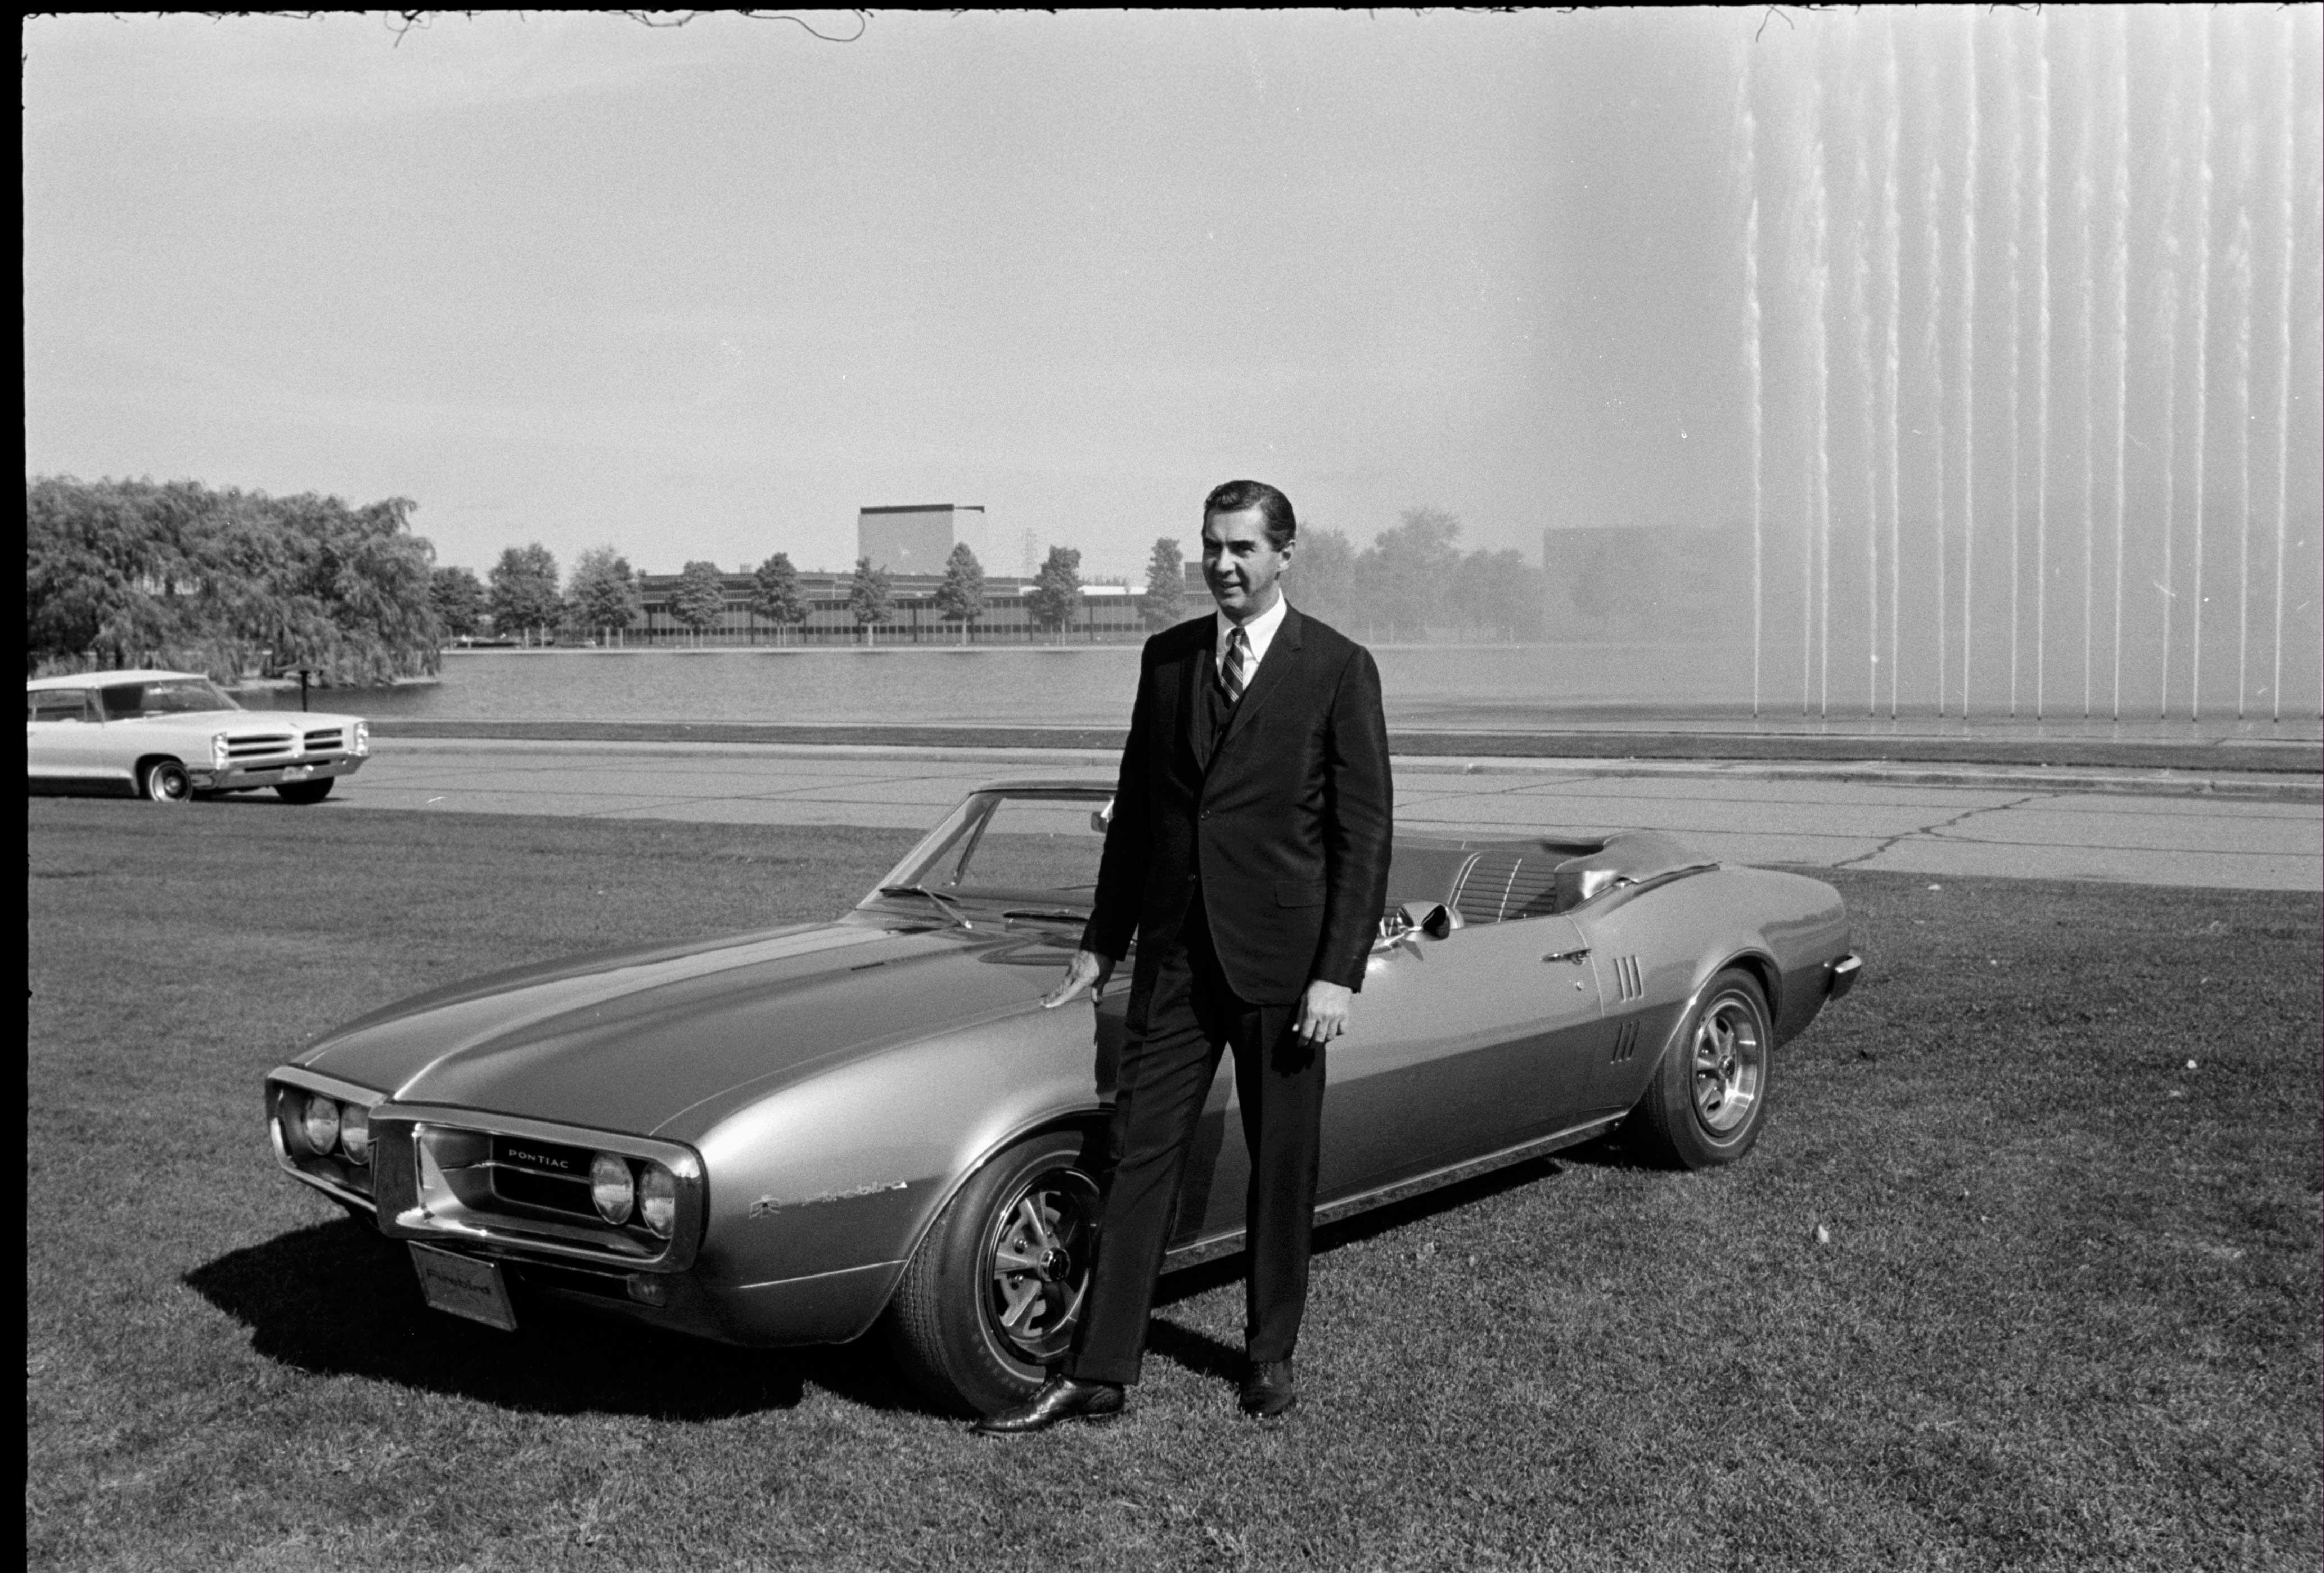 1967 Pontiac Firebird - John Delorean